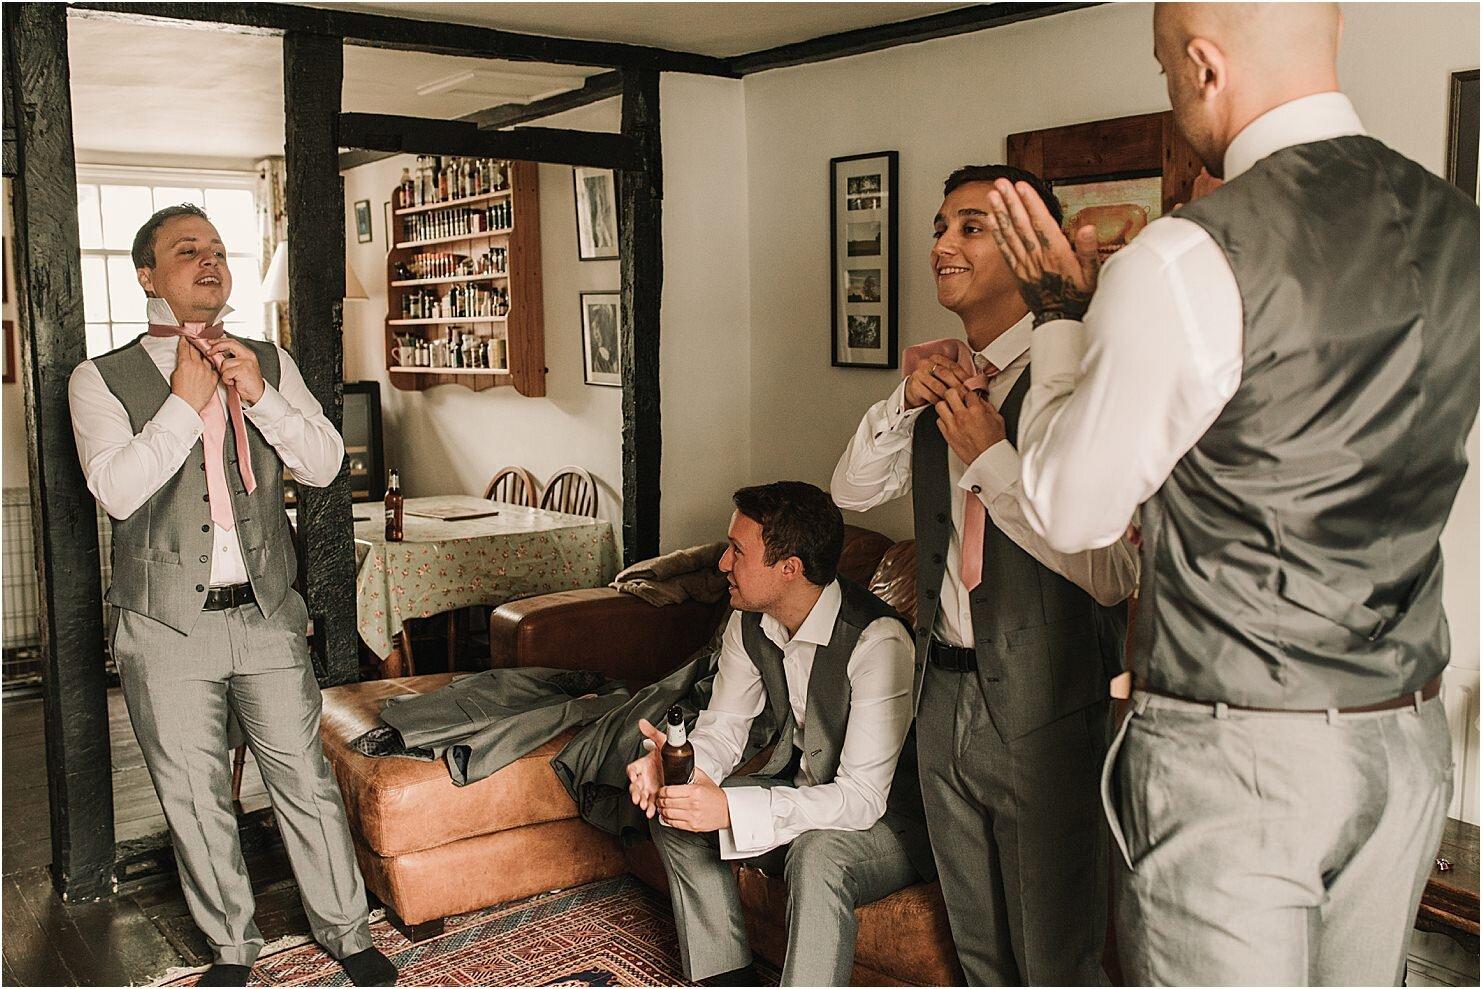 boda-de-cuento-en-castillo-boda-en-londres-6.jpg